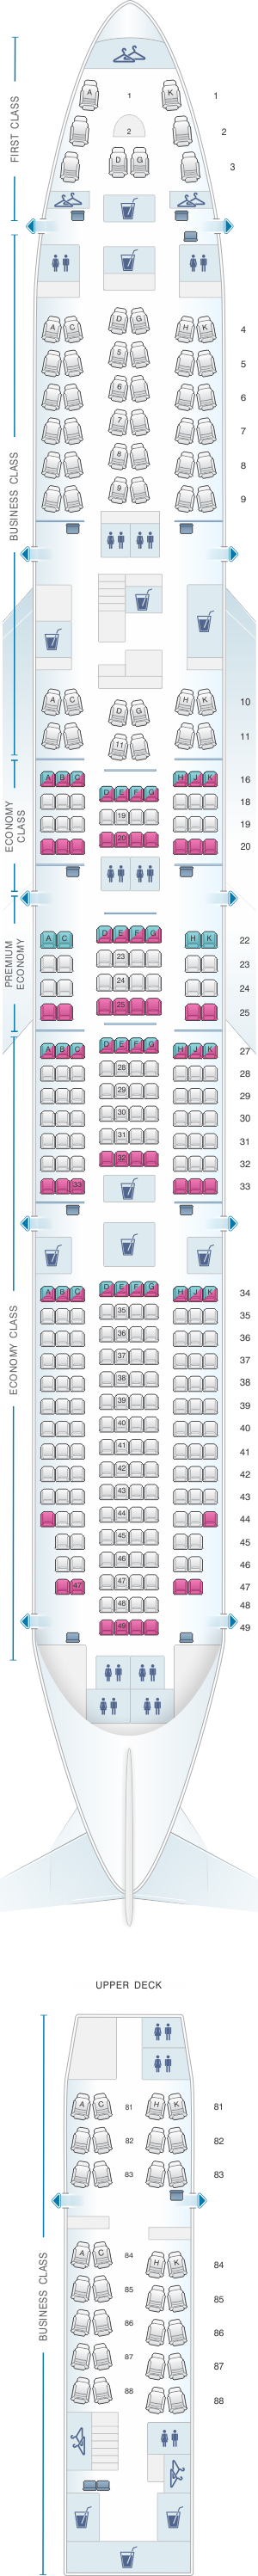 Seat map for Lufthansa Boeing B747-8 364pax